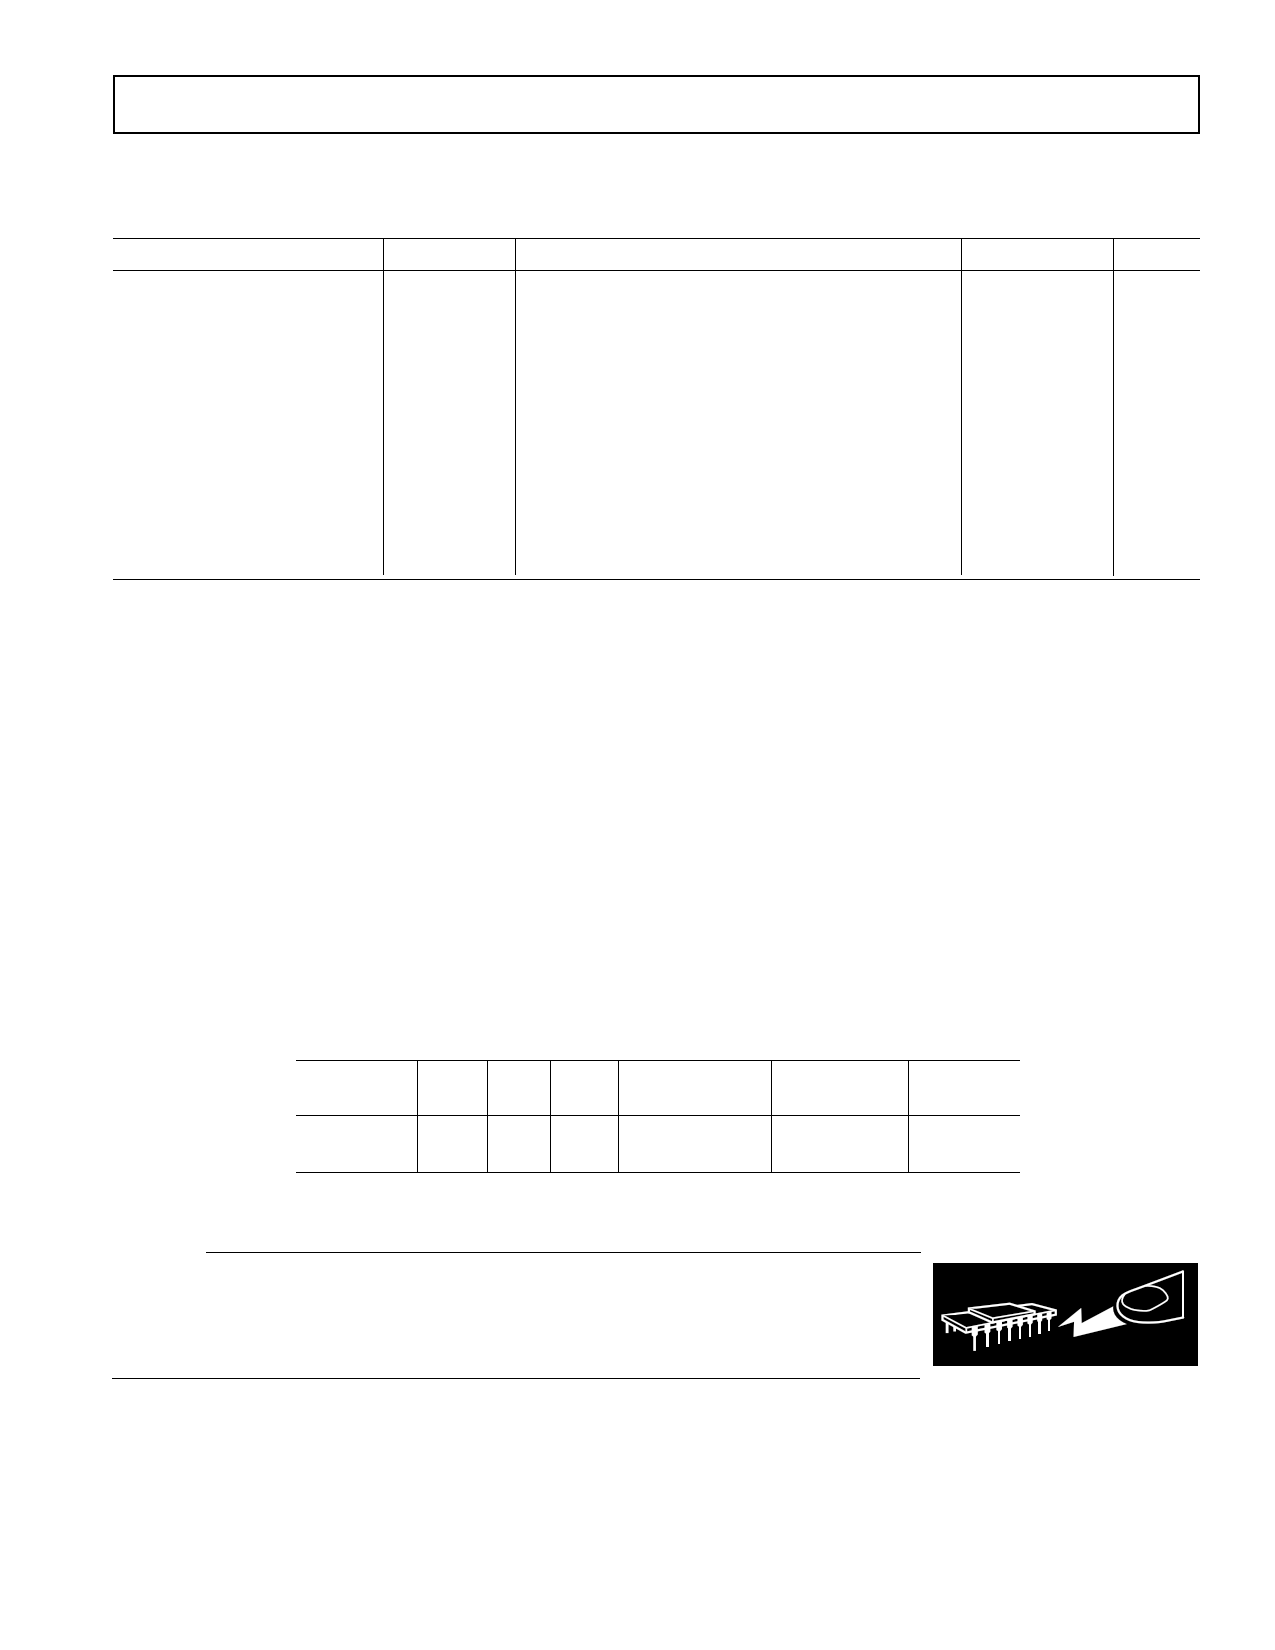 AD5554 pdf, arduino